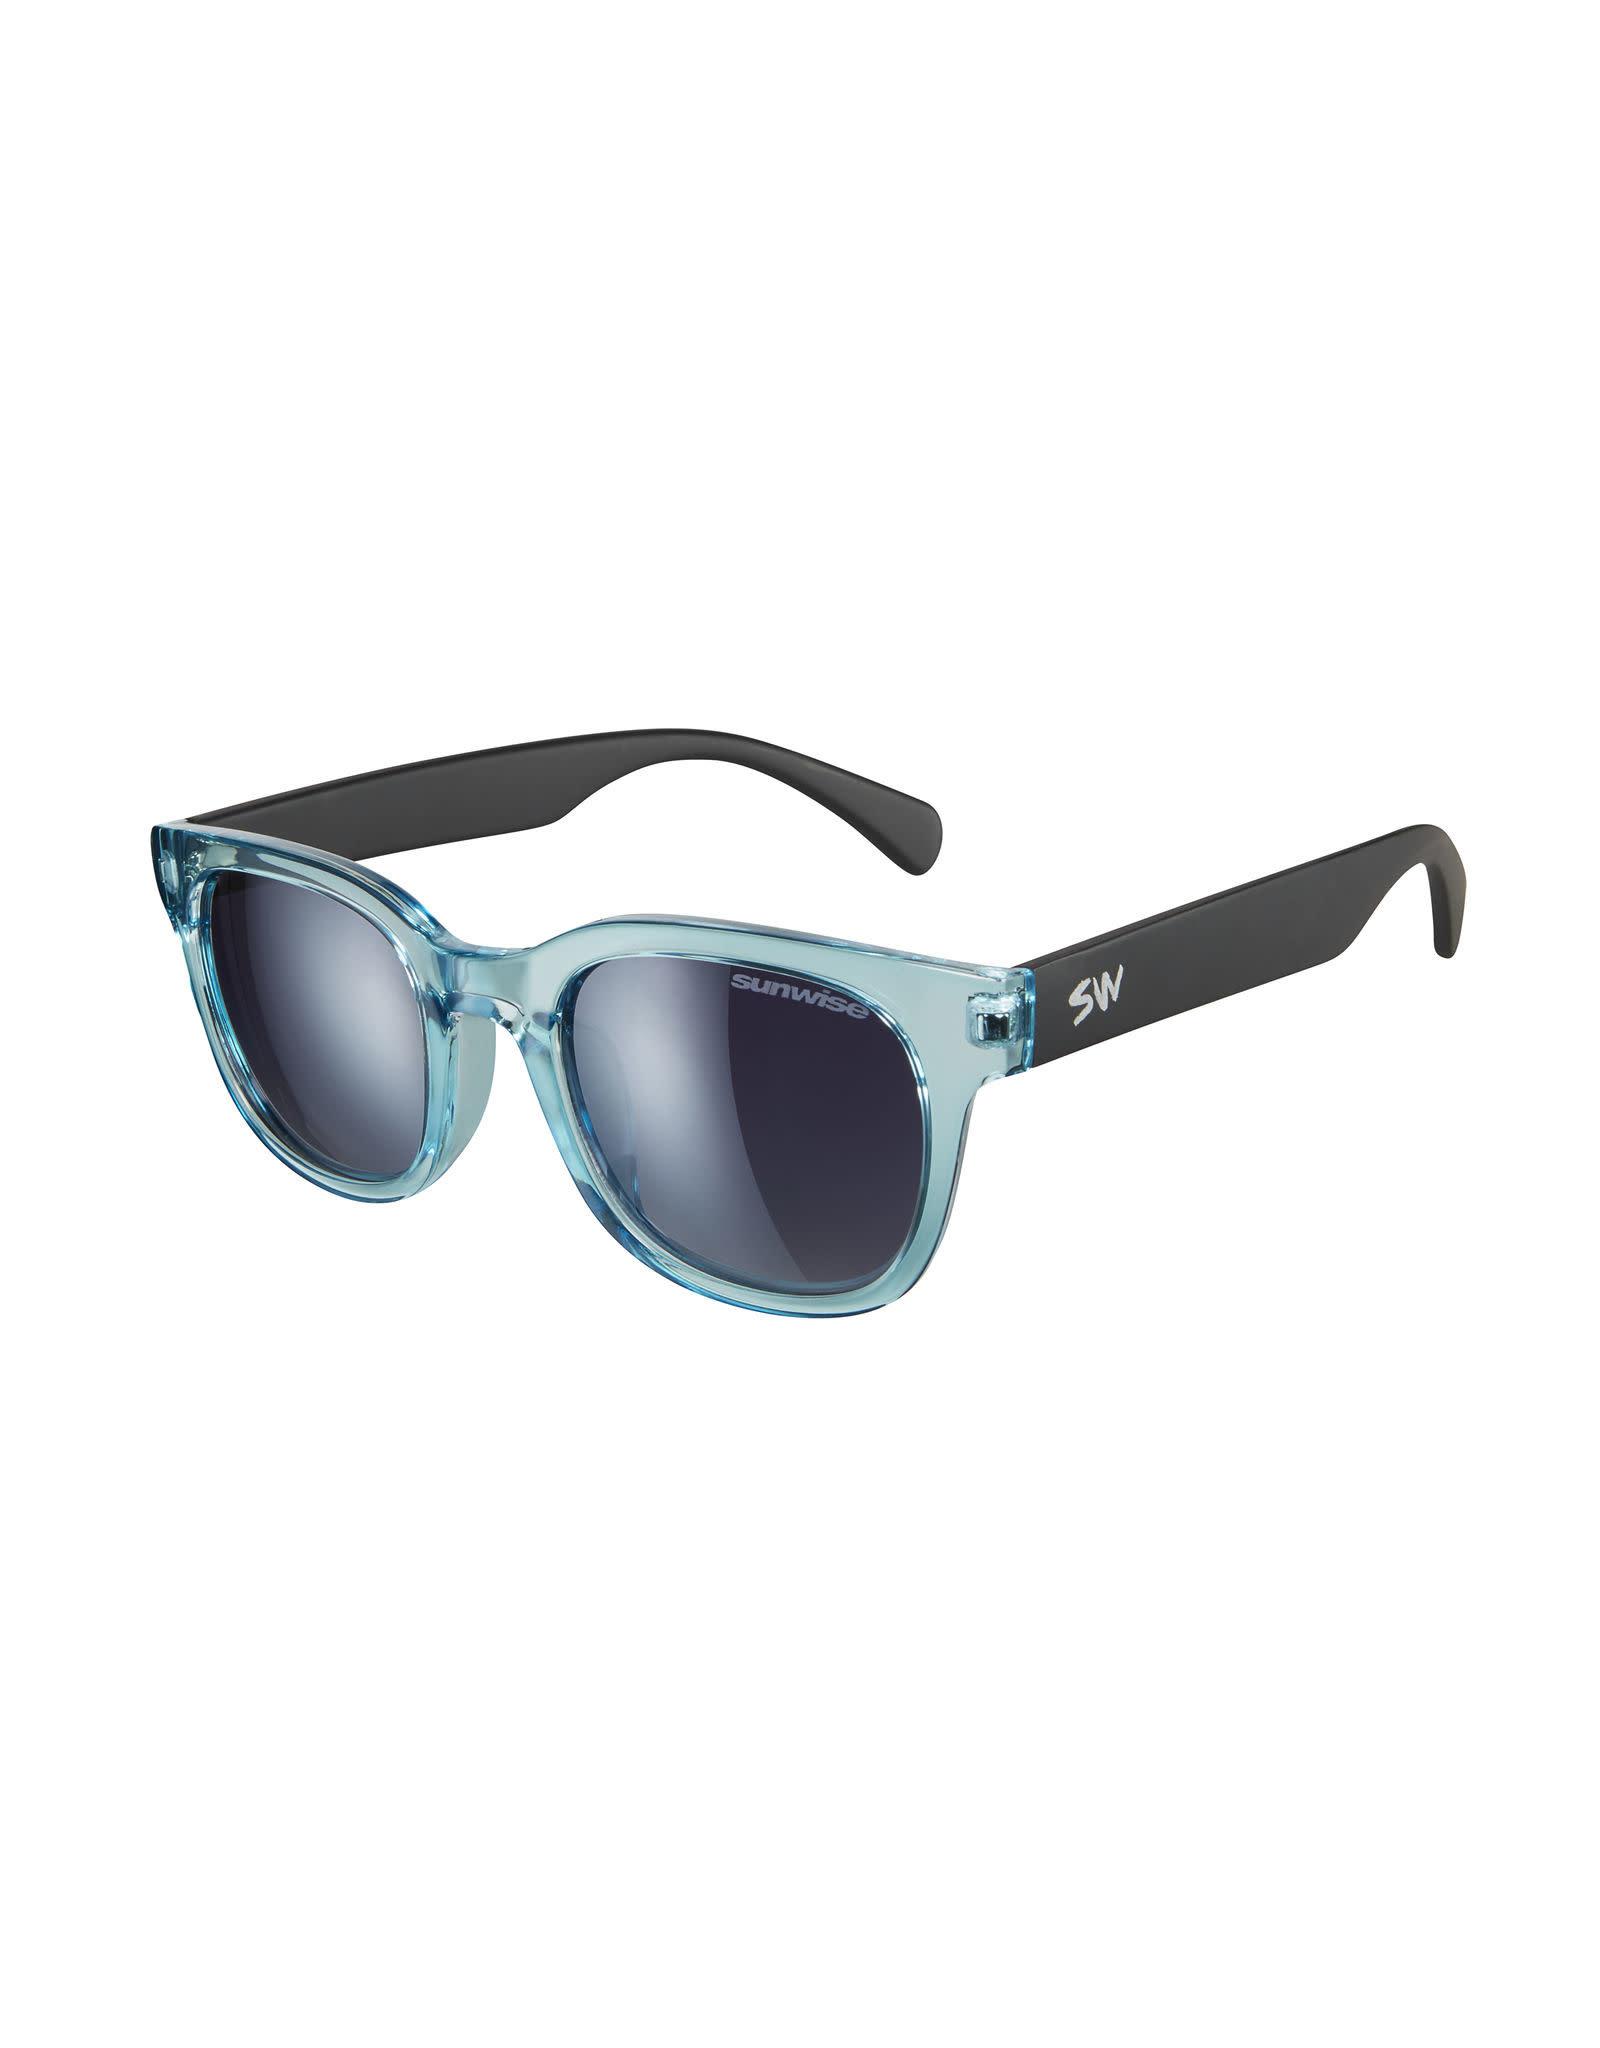 Sunwise Breeze Retro Cycling Sunglasses